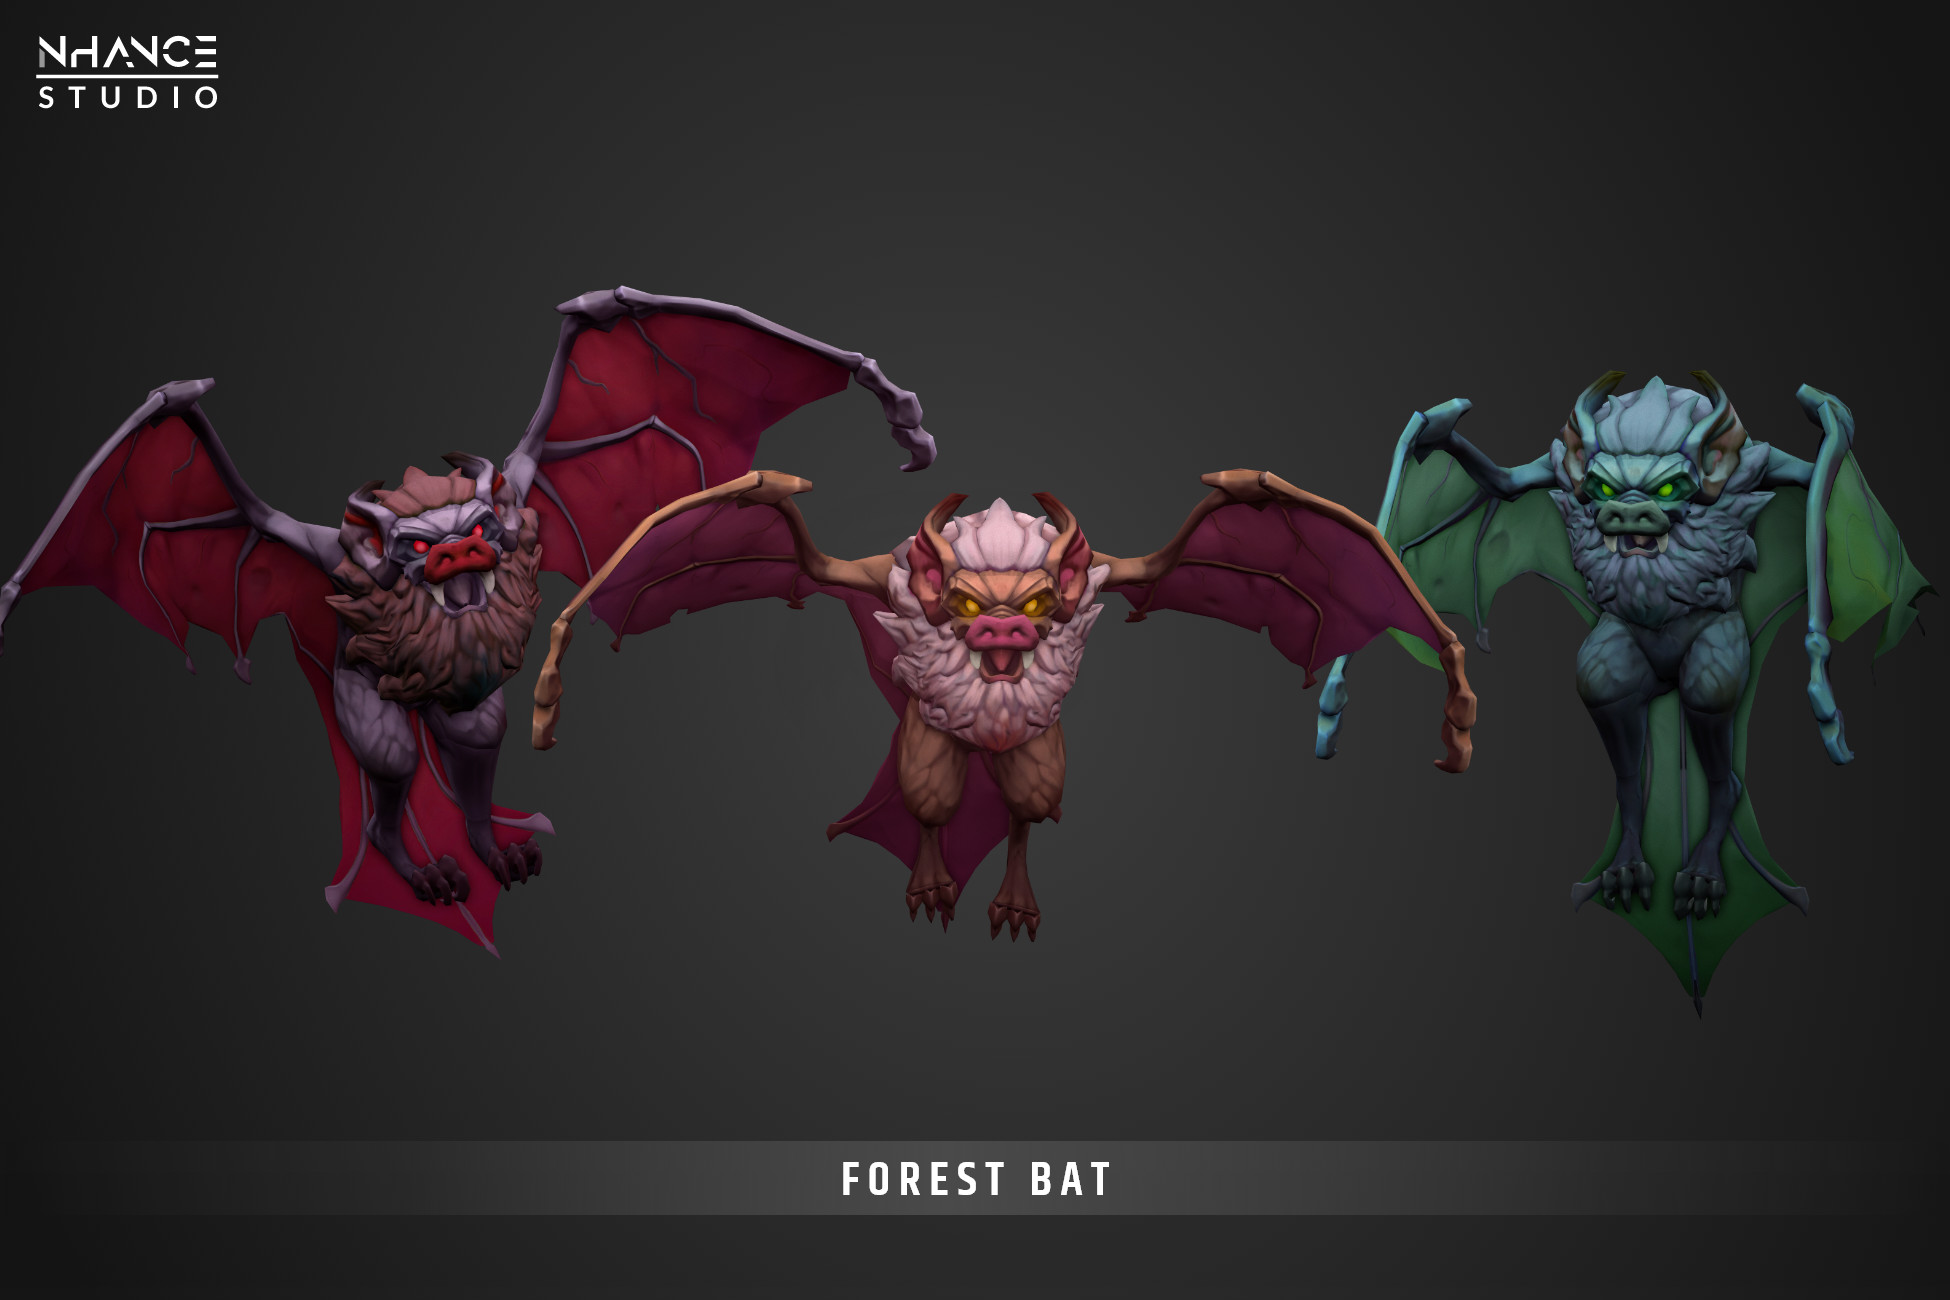 Stylized Fantasy Forest Bat